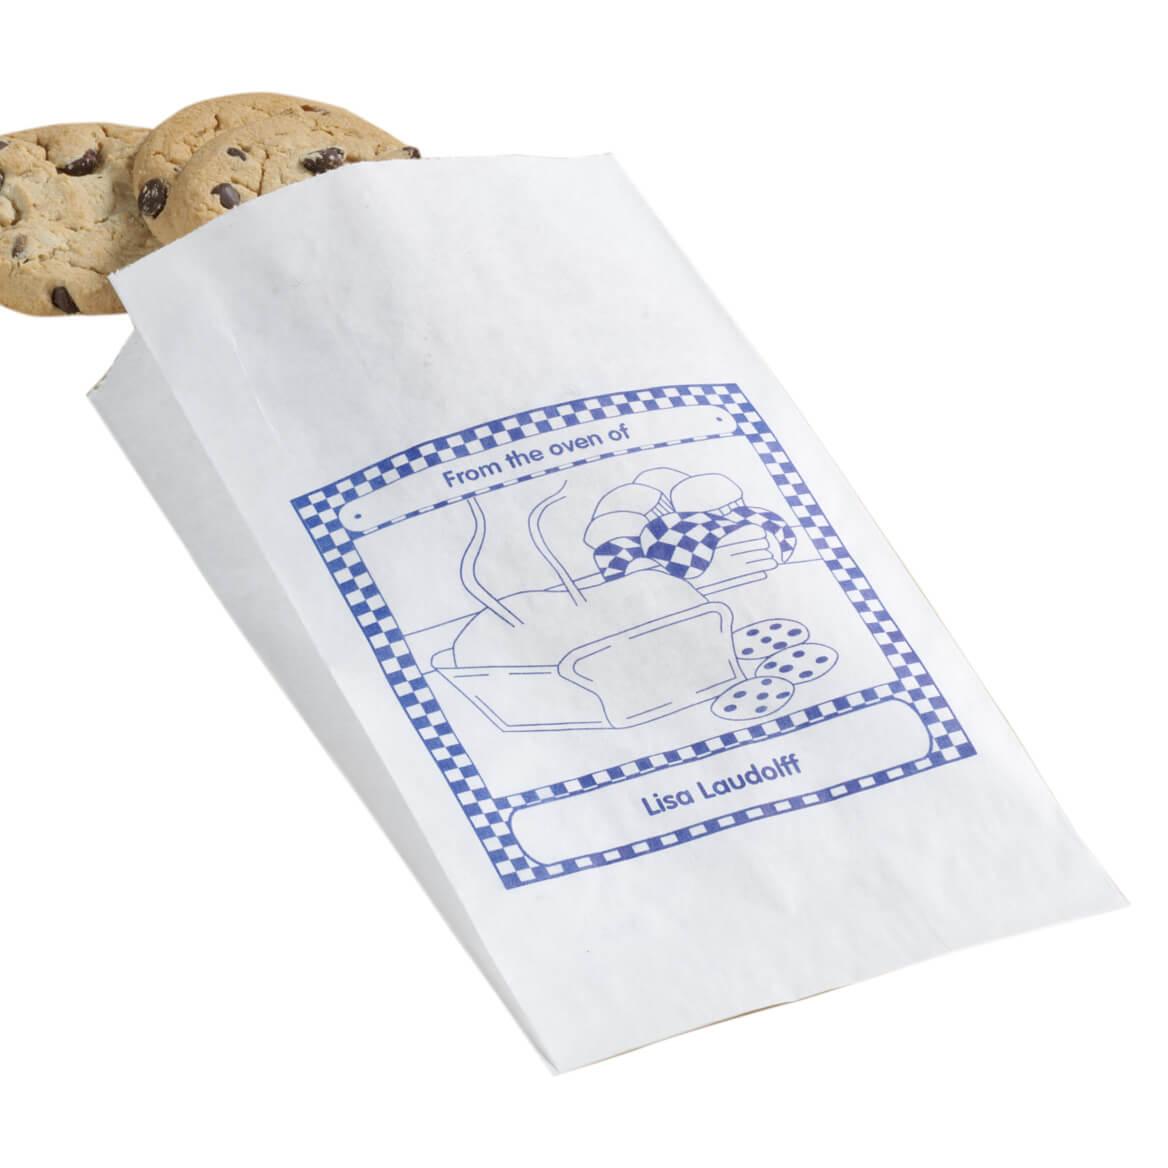 Pers Homebaked Goodness Bag Bakery Set/12